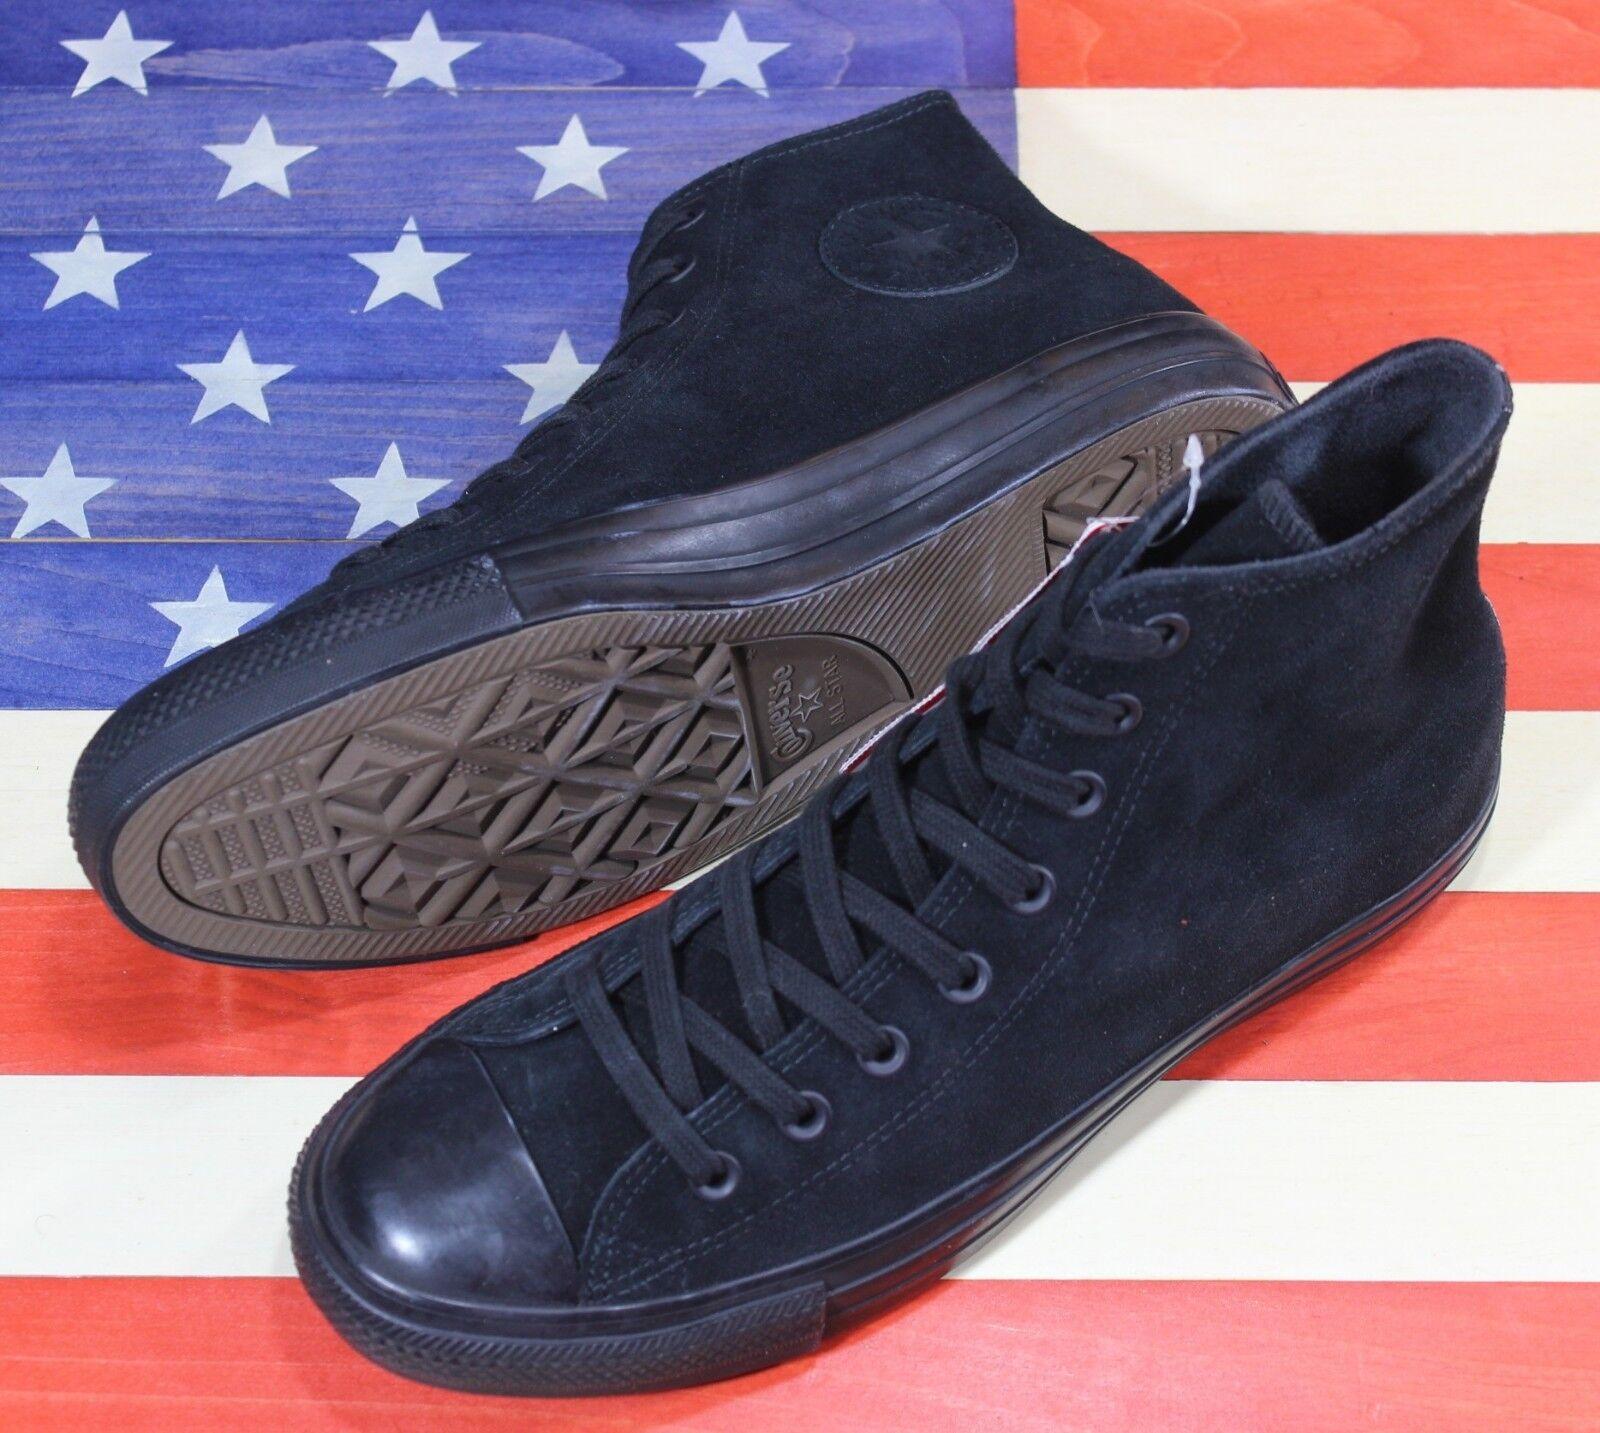 CONVERSE SAMPLE Chuck Taylor ALL-STAR HI Plush Suede nero scarpe [157520C] Mens 9